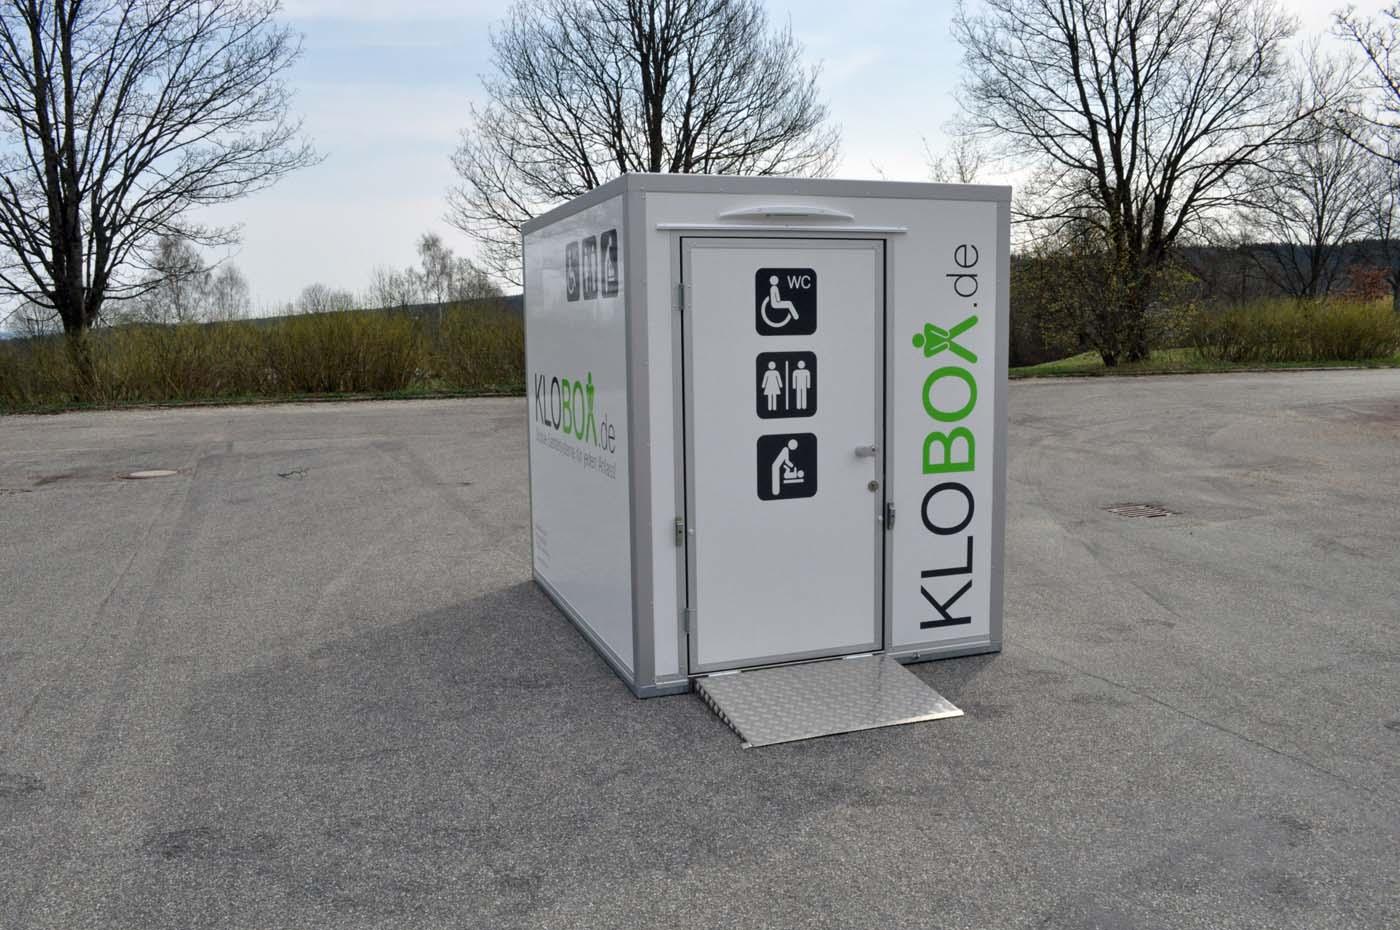 KLOBOX 250 [KX-1702] #01